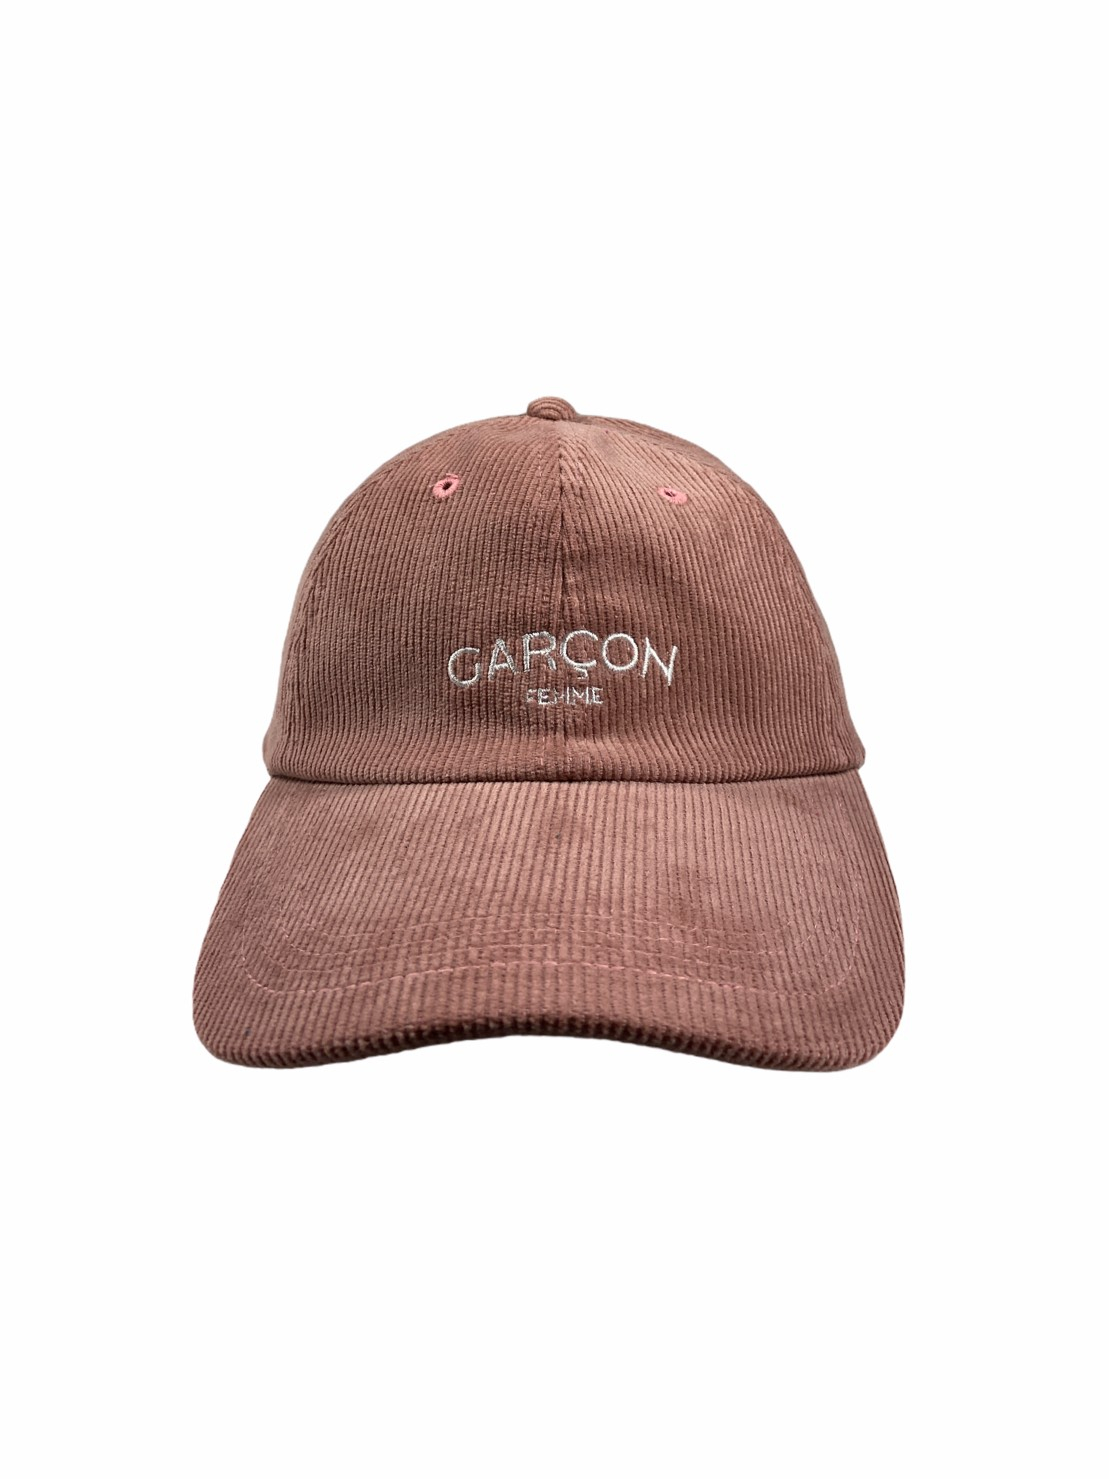 Garcon Cap - Femme (Rose Gold Pink)